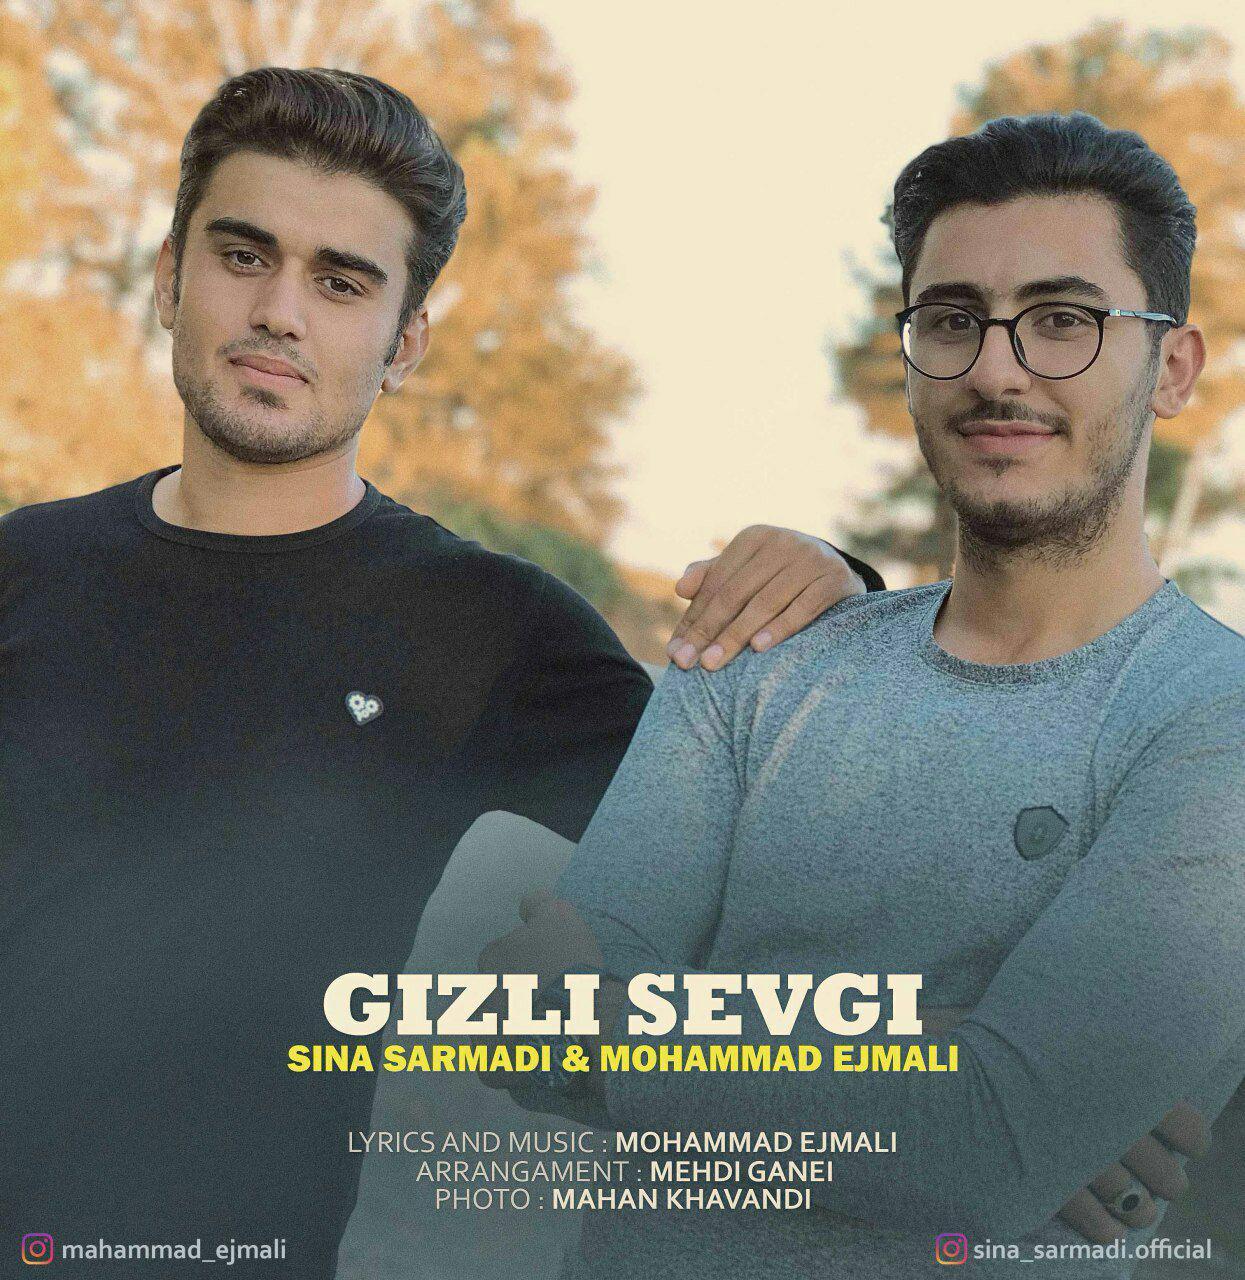 http://birtunes.ir/wp-content/uploads/2018/11/Sina-Sarmadi-Mohammad-Ejmali-Gizli-Sevgi.jpg